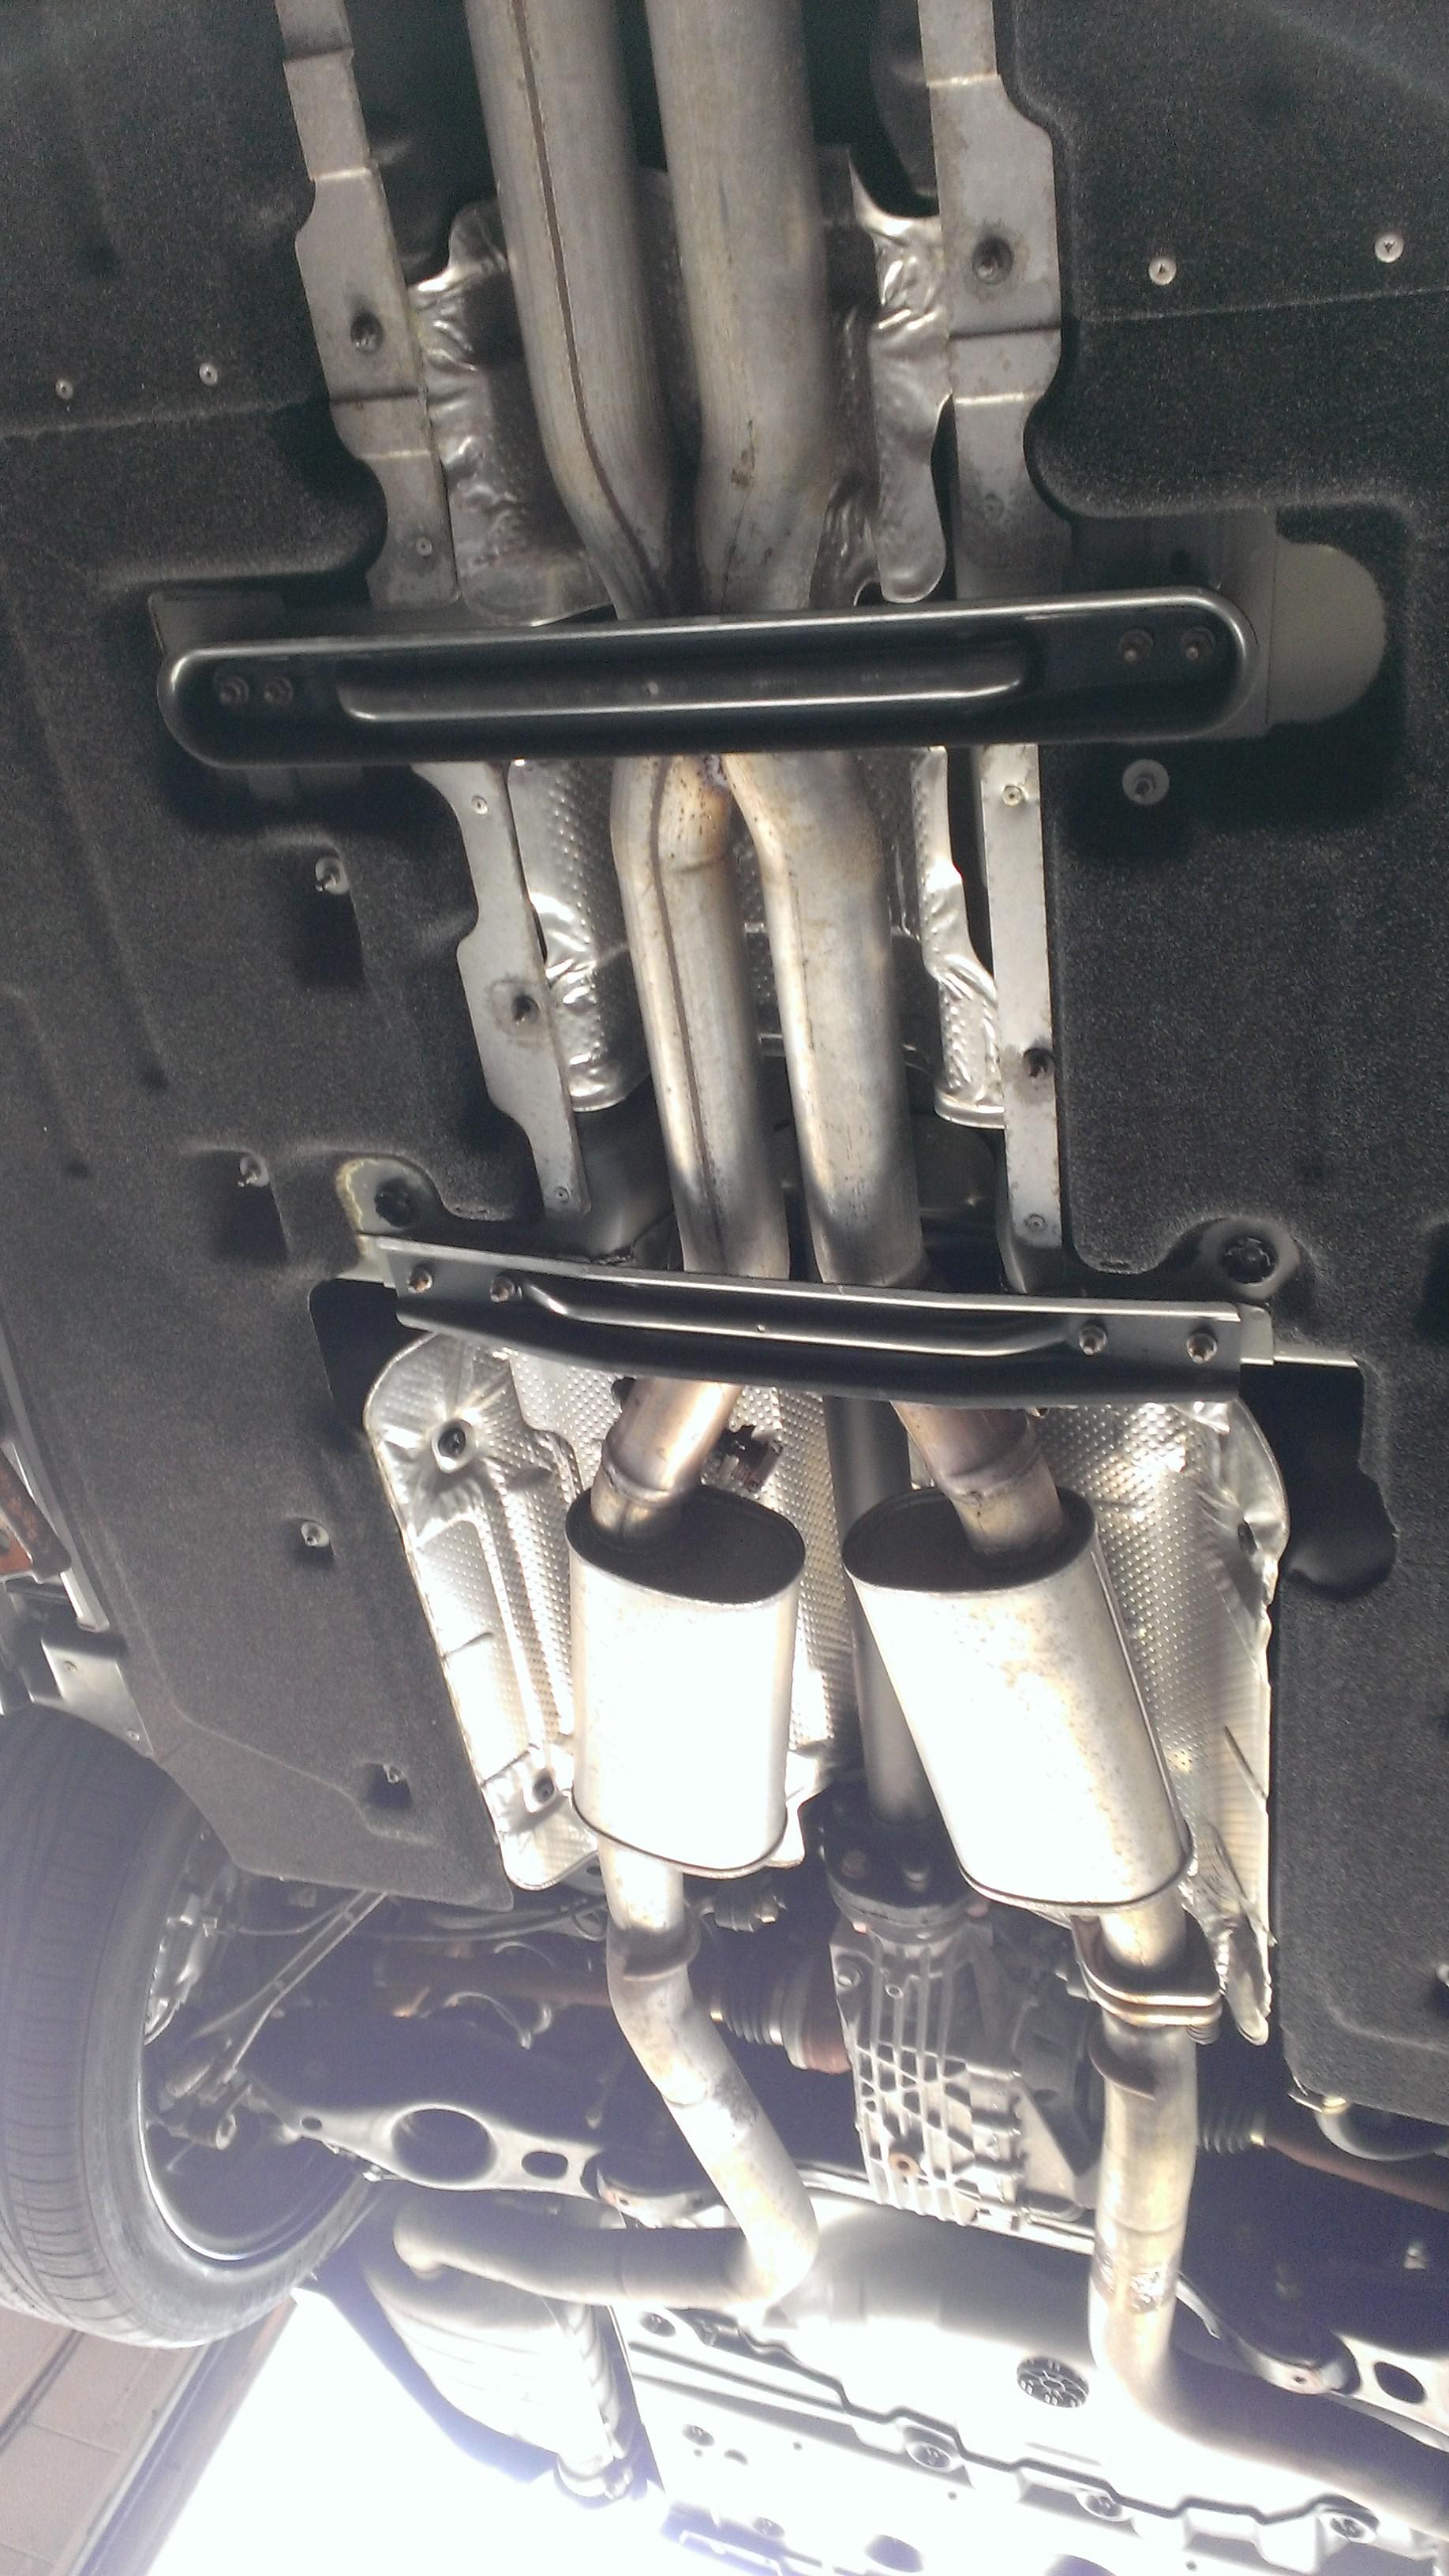 underside pictures of stock exhaust here chrysler 300c forum 300c 2004 hyundai santa fe exhaust diagram wp_20140906_015 by sixpointzero, on flickr